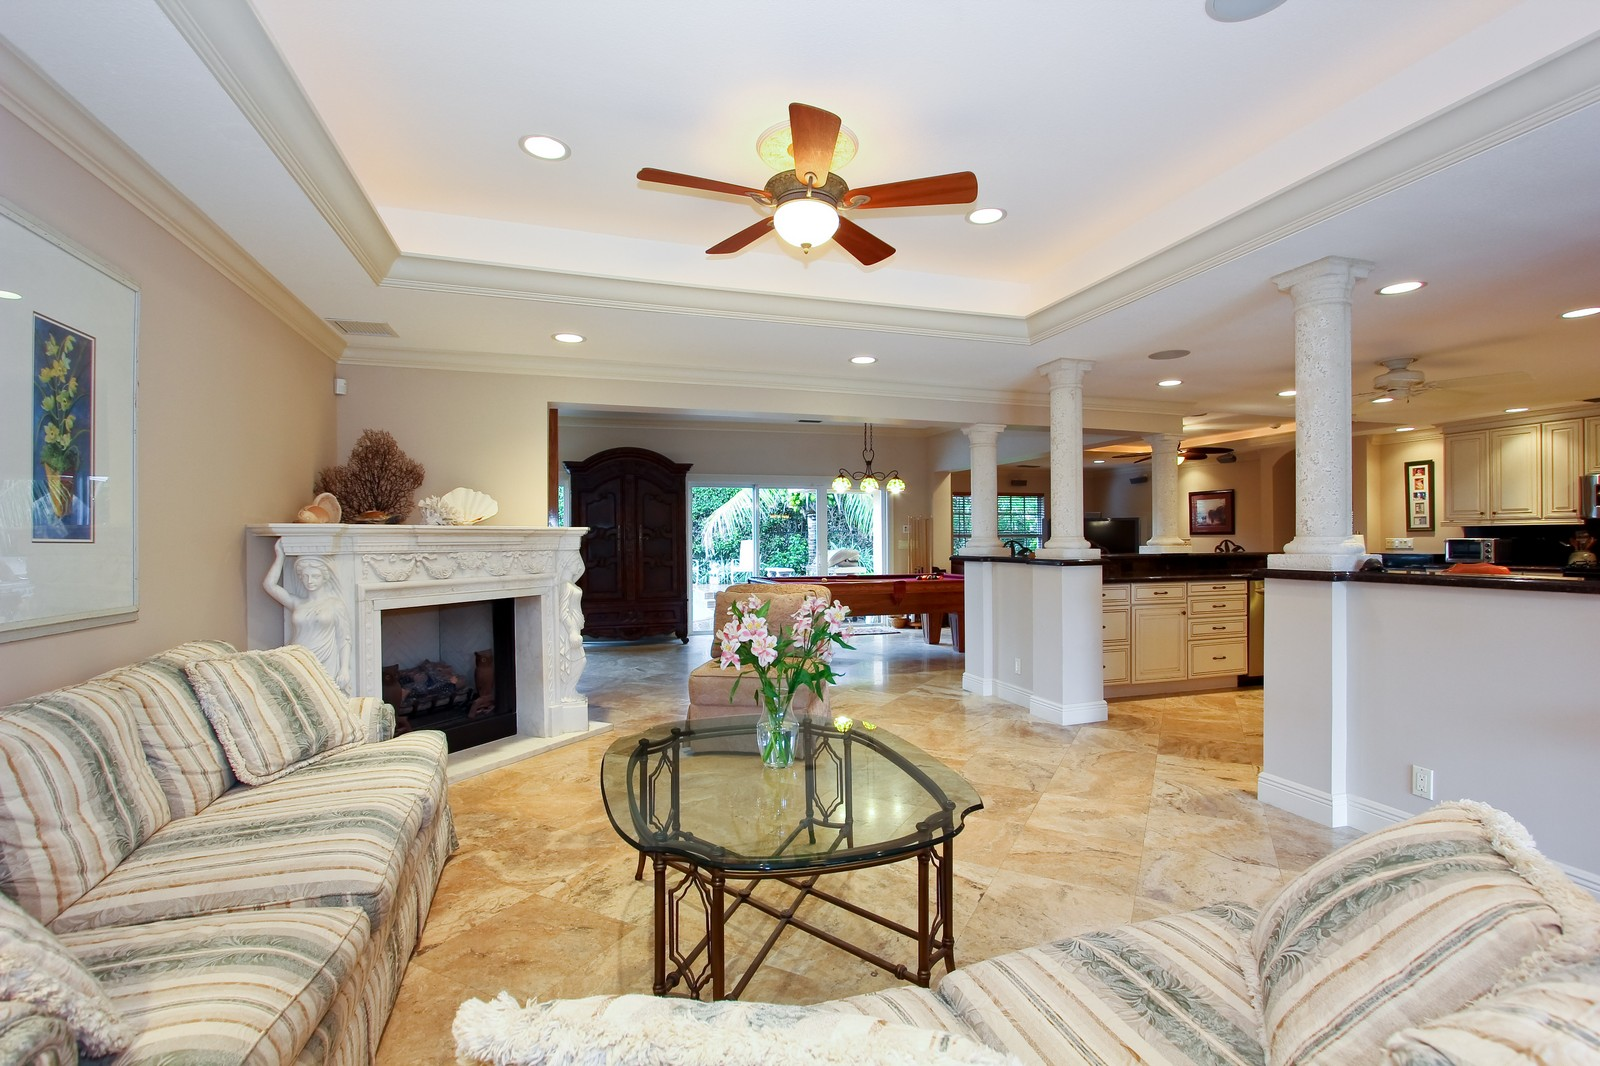 Real Estate Photography - 430 N. Lyra Circle, Juno Beach, FL, 33408 - Living Room